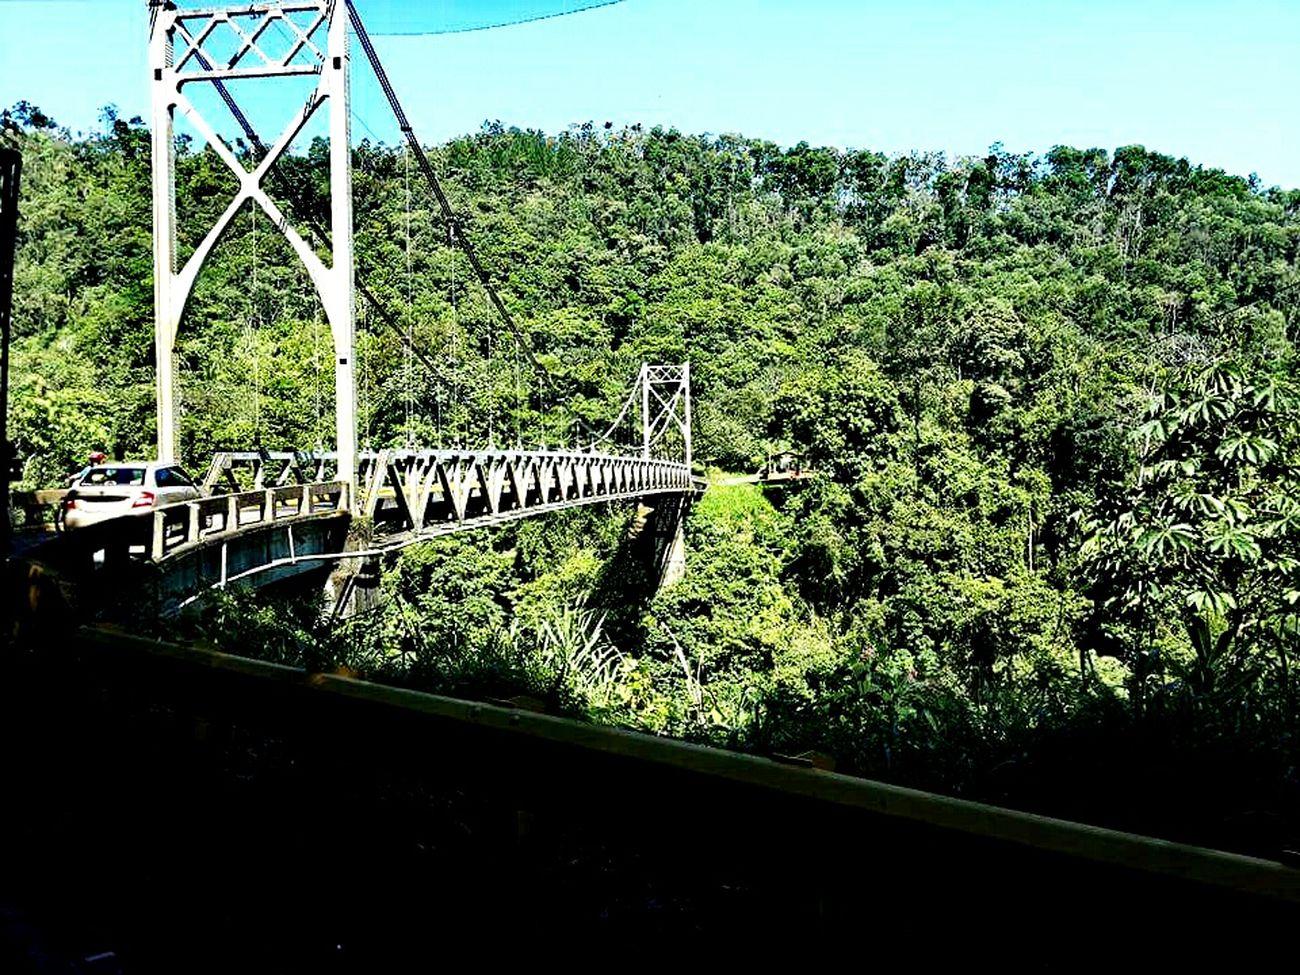 Bridge View Costa Rica Allgreen Pura Vida ✌